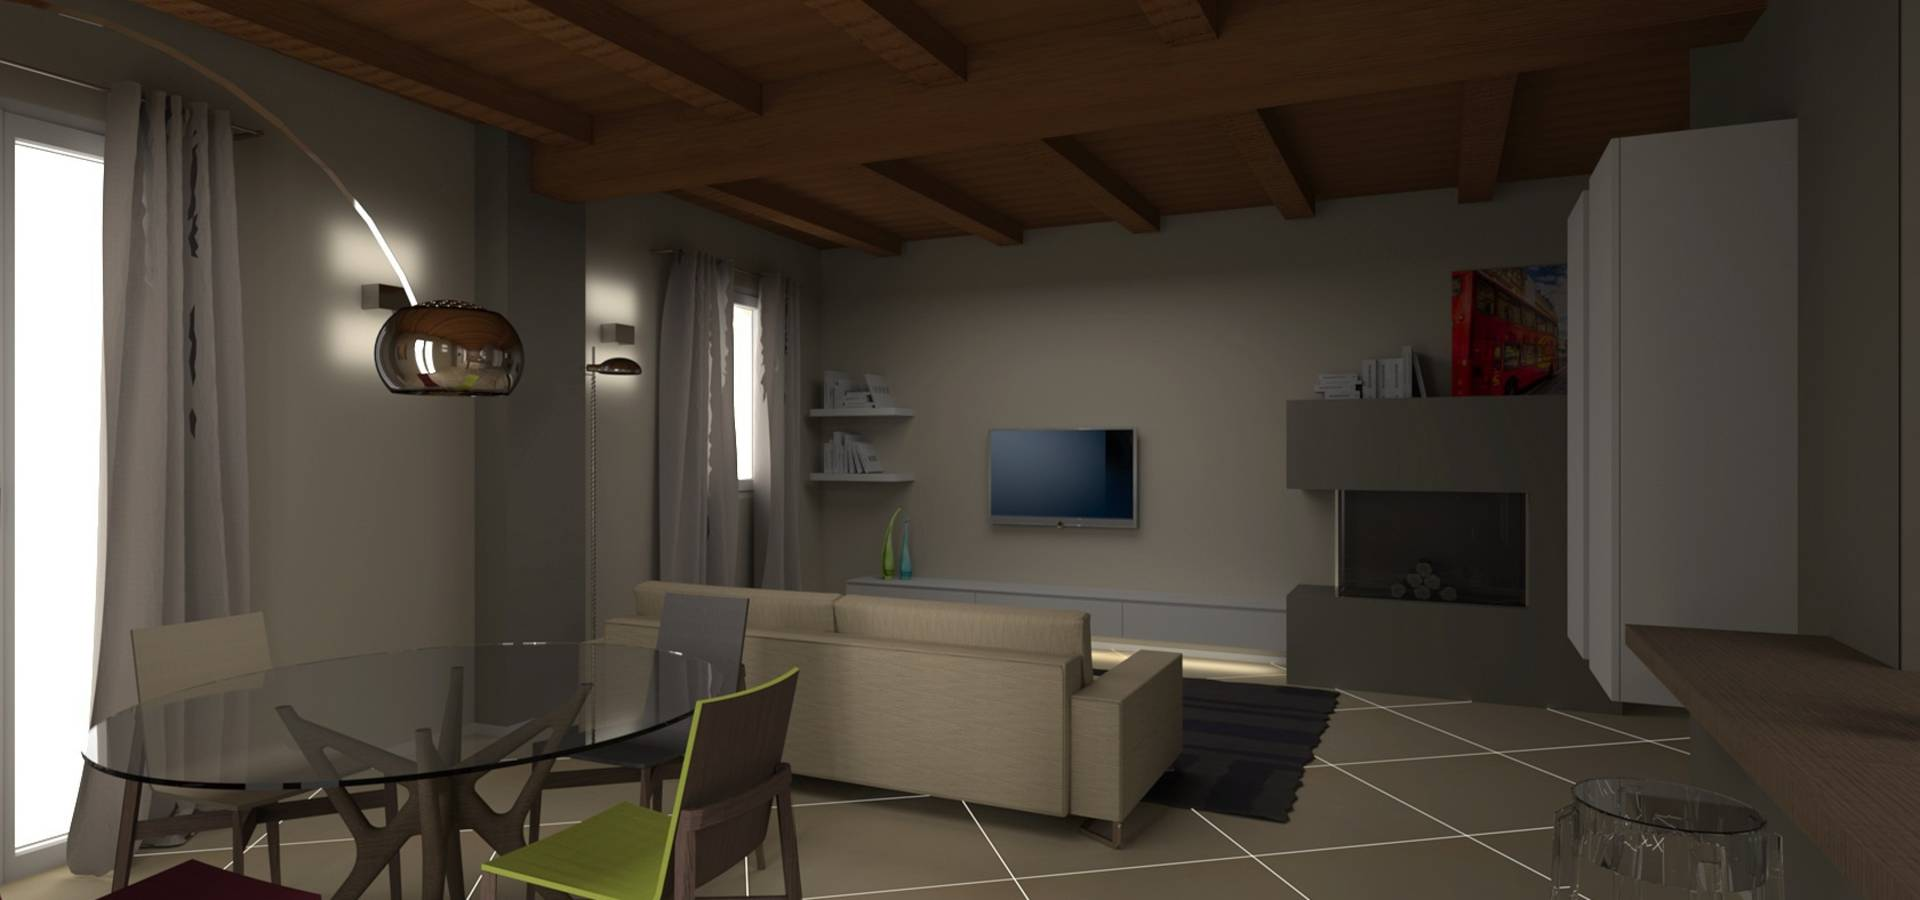 Progettazione dInterni: Arquitectos de interiores en Bagnacavallo (RA ...